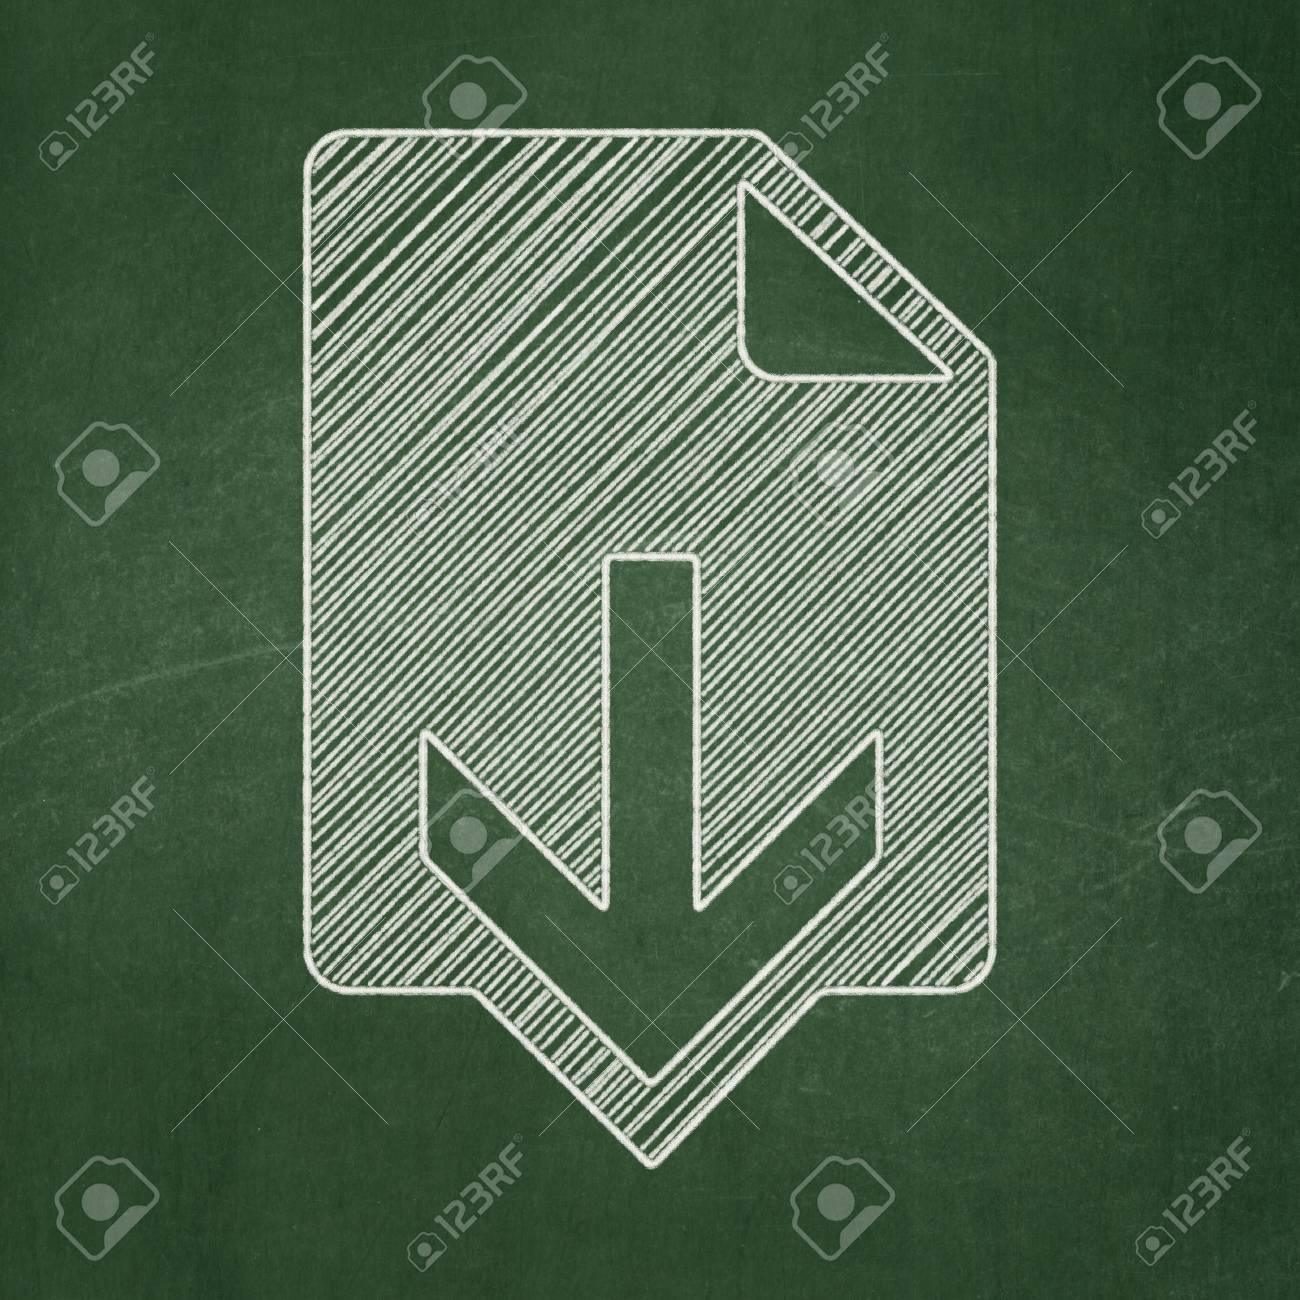 web development concept download icon on green chalkboard